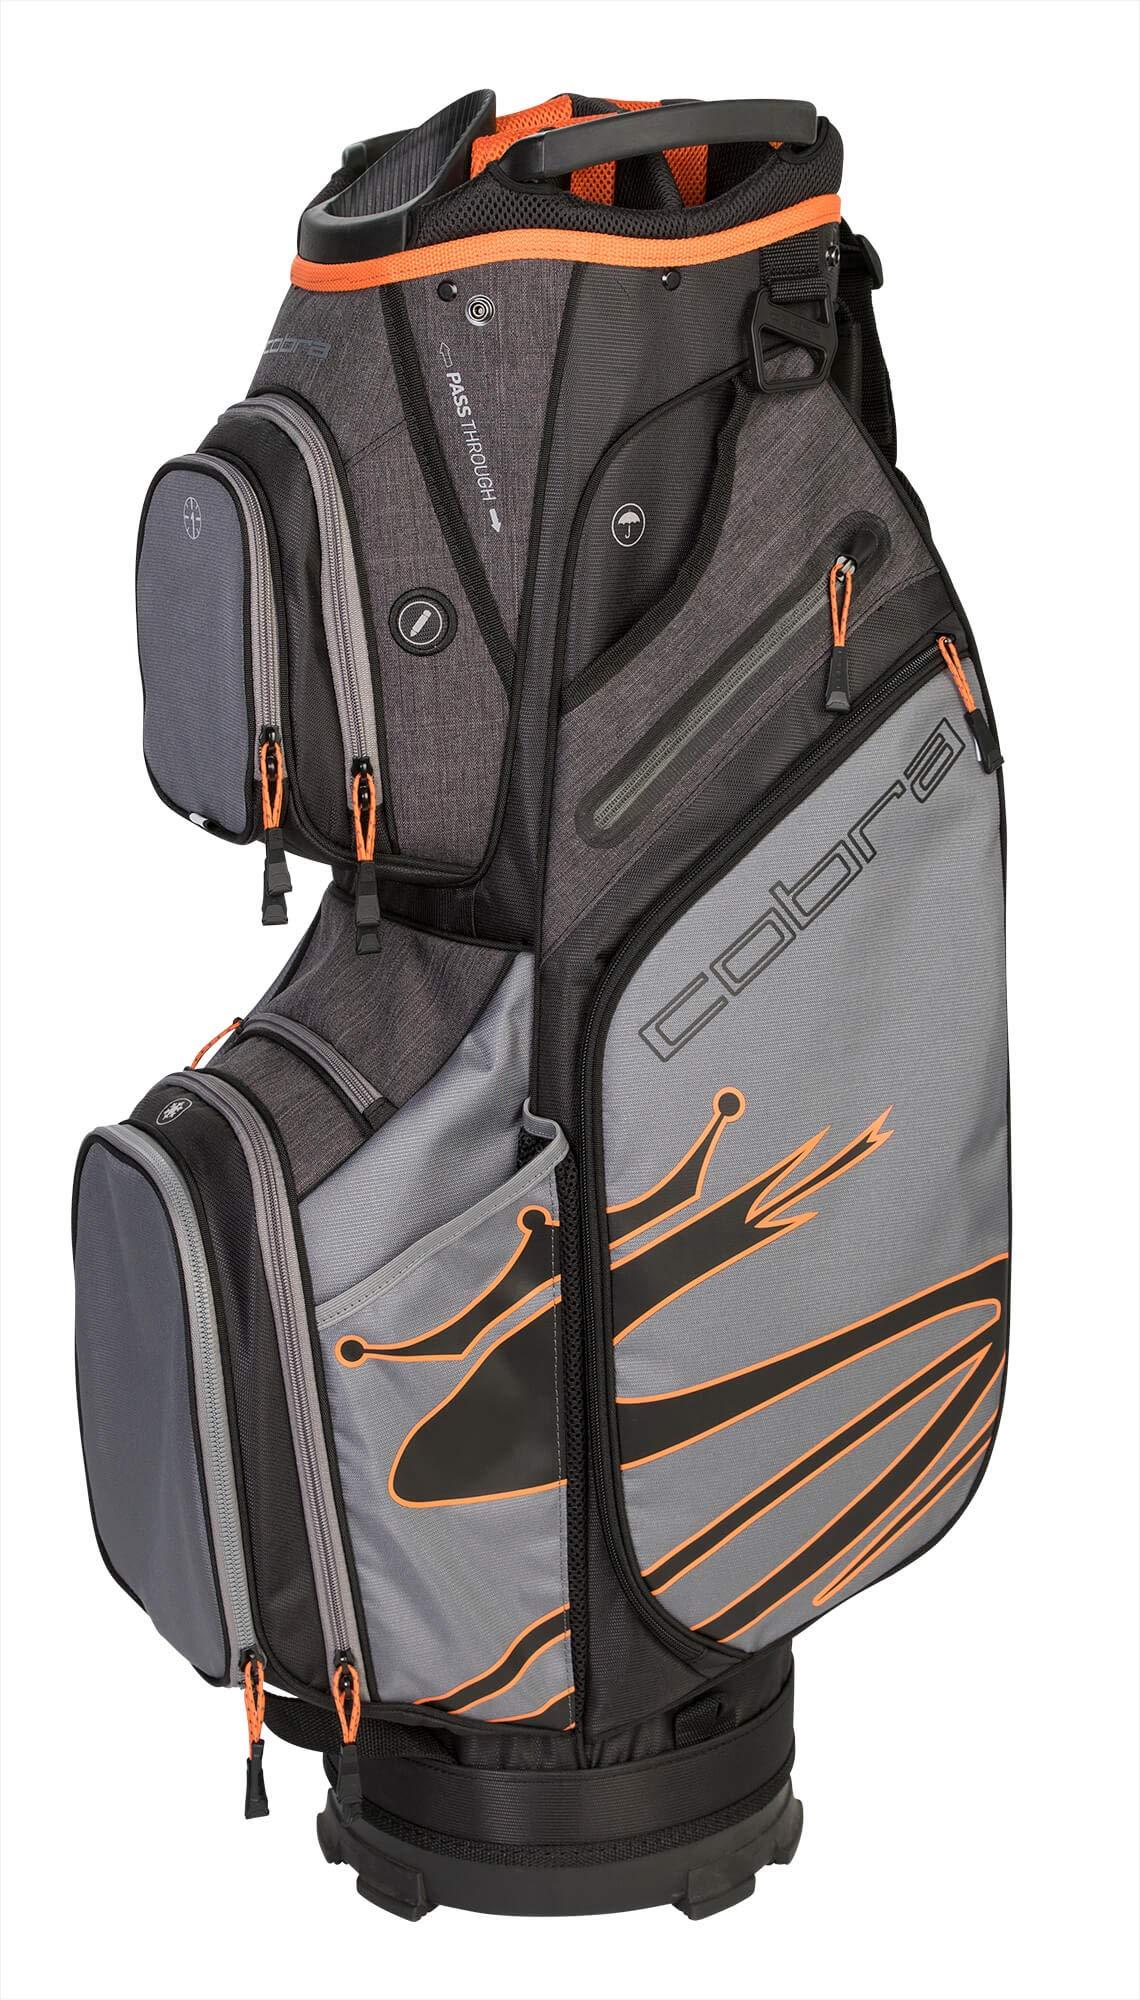 Cobra Golf 2019 Ultralight Cart Bag (Black-Orange)